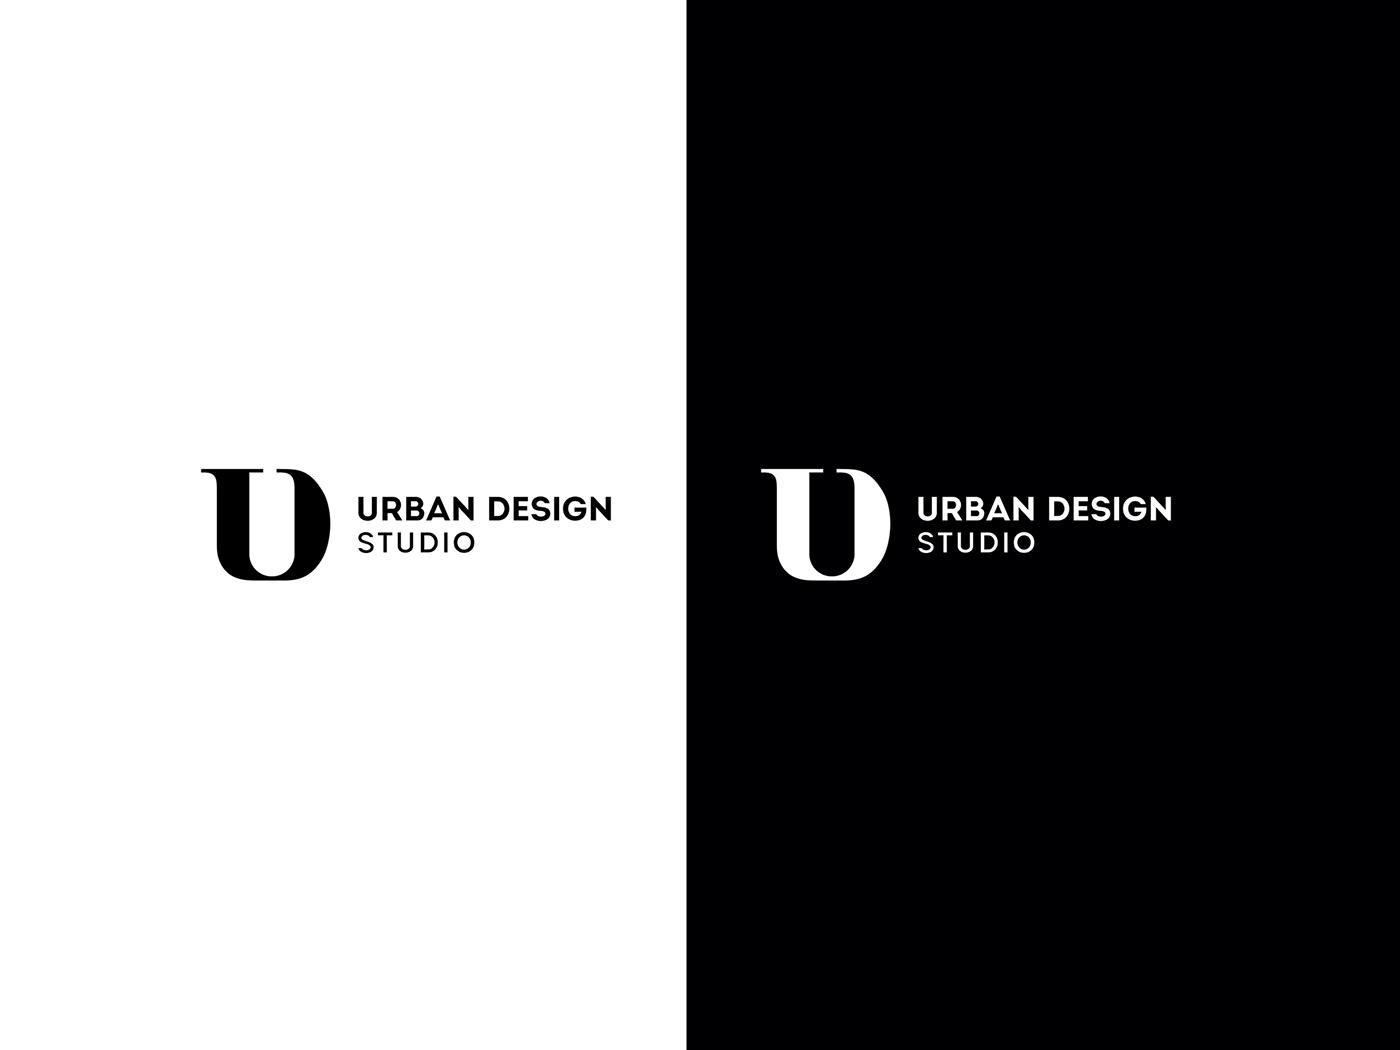 Urban design studio brand identity print logo stationary